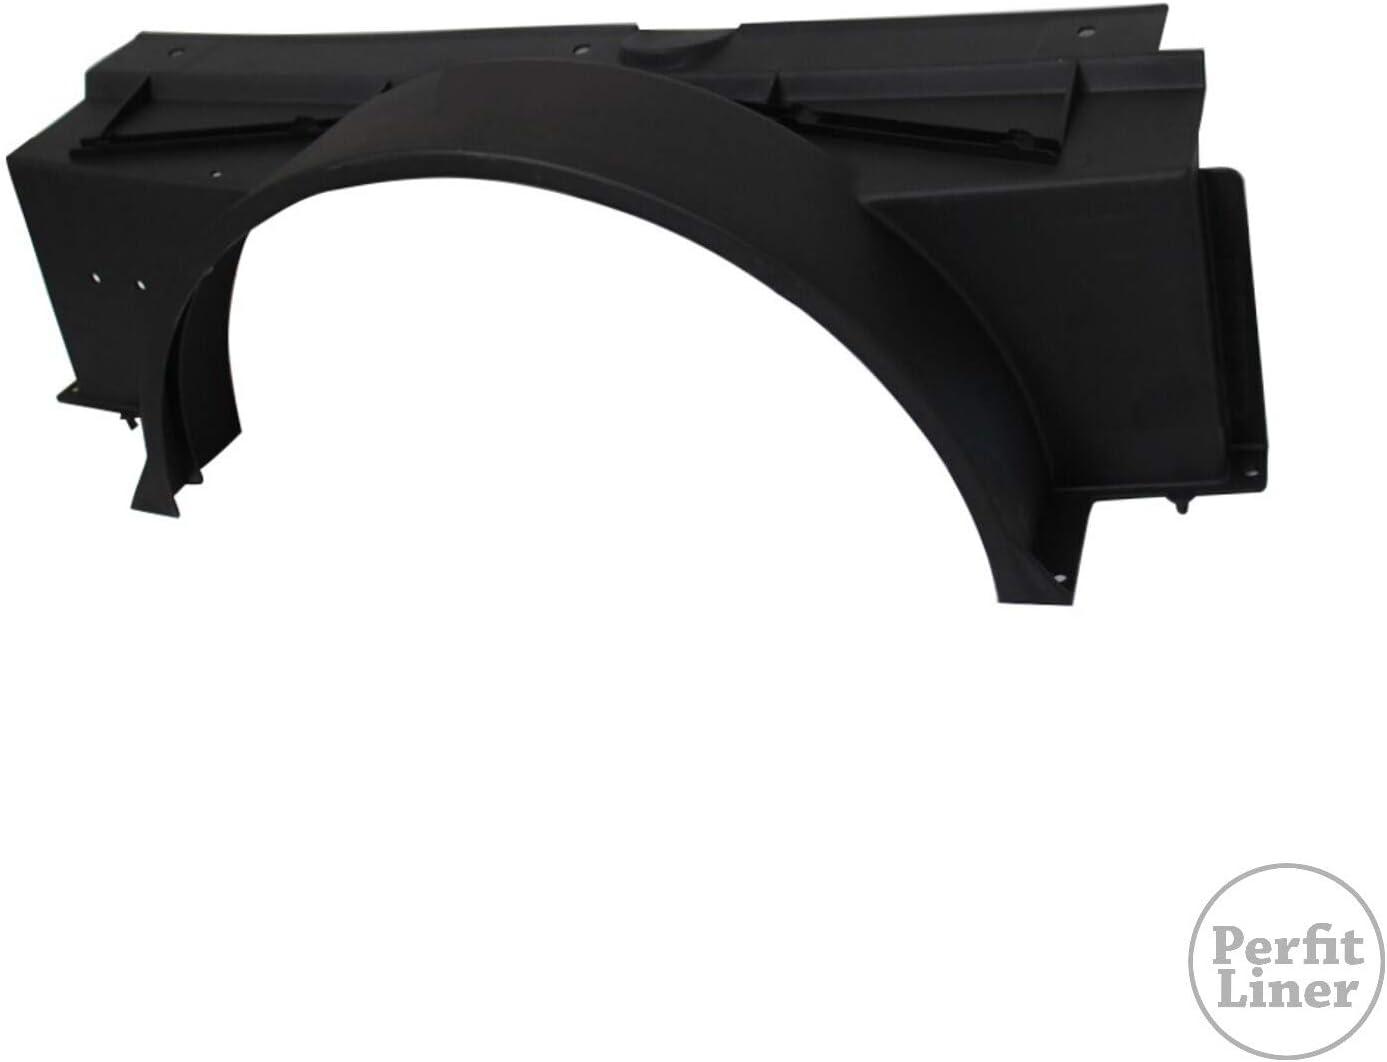 New Fan Shroud Upper For Chevy Suburban Chevrolet Tahoe Blazer 94 GM3110126 Fits 15739587